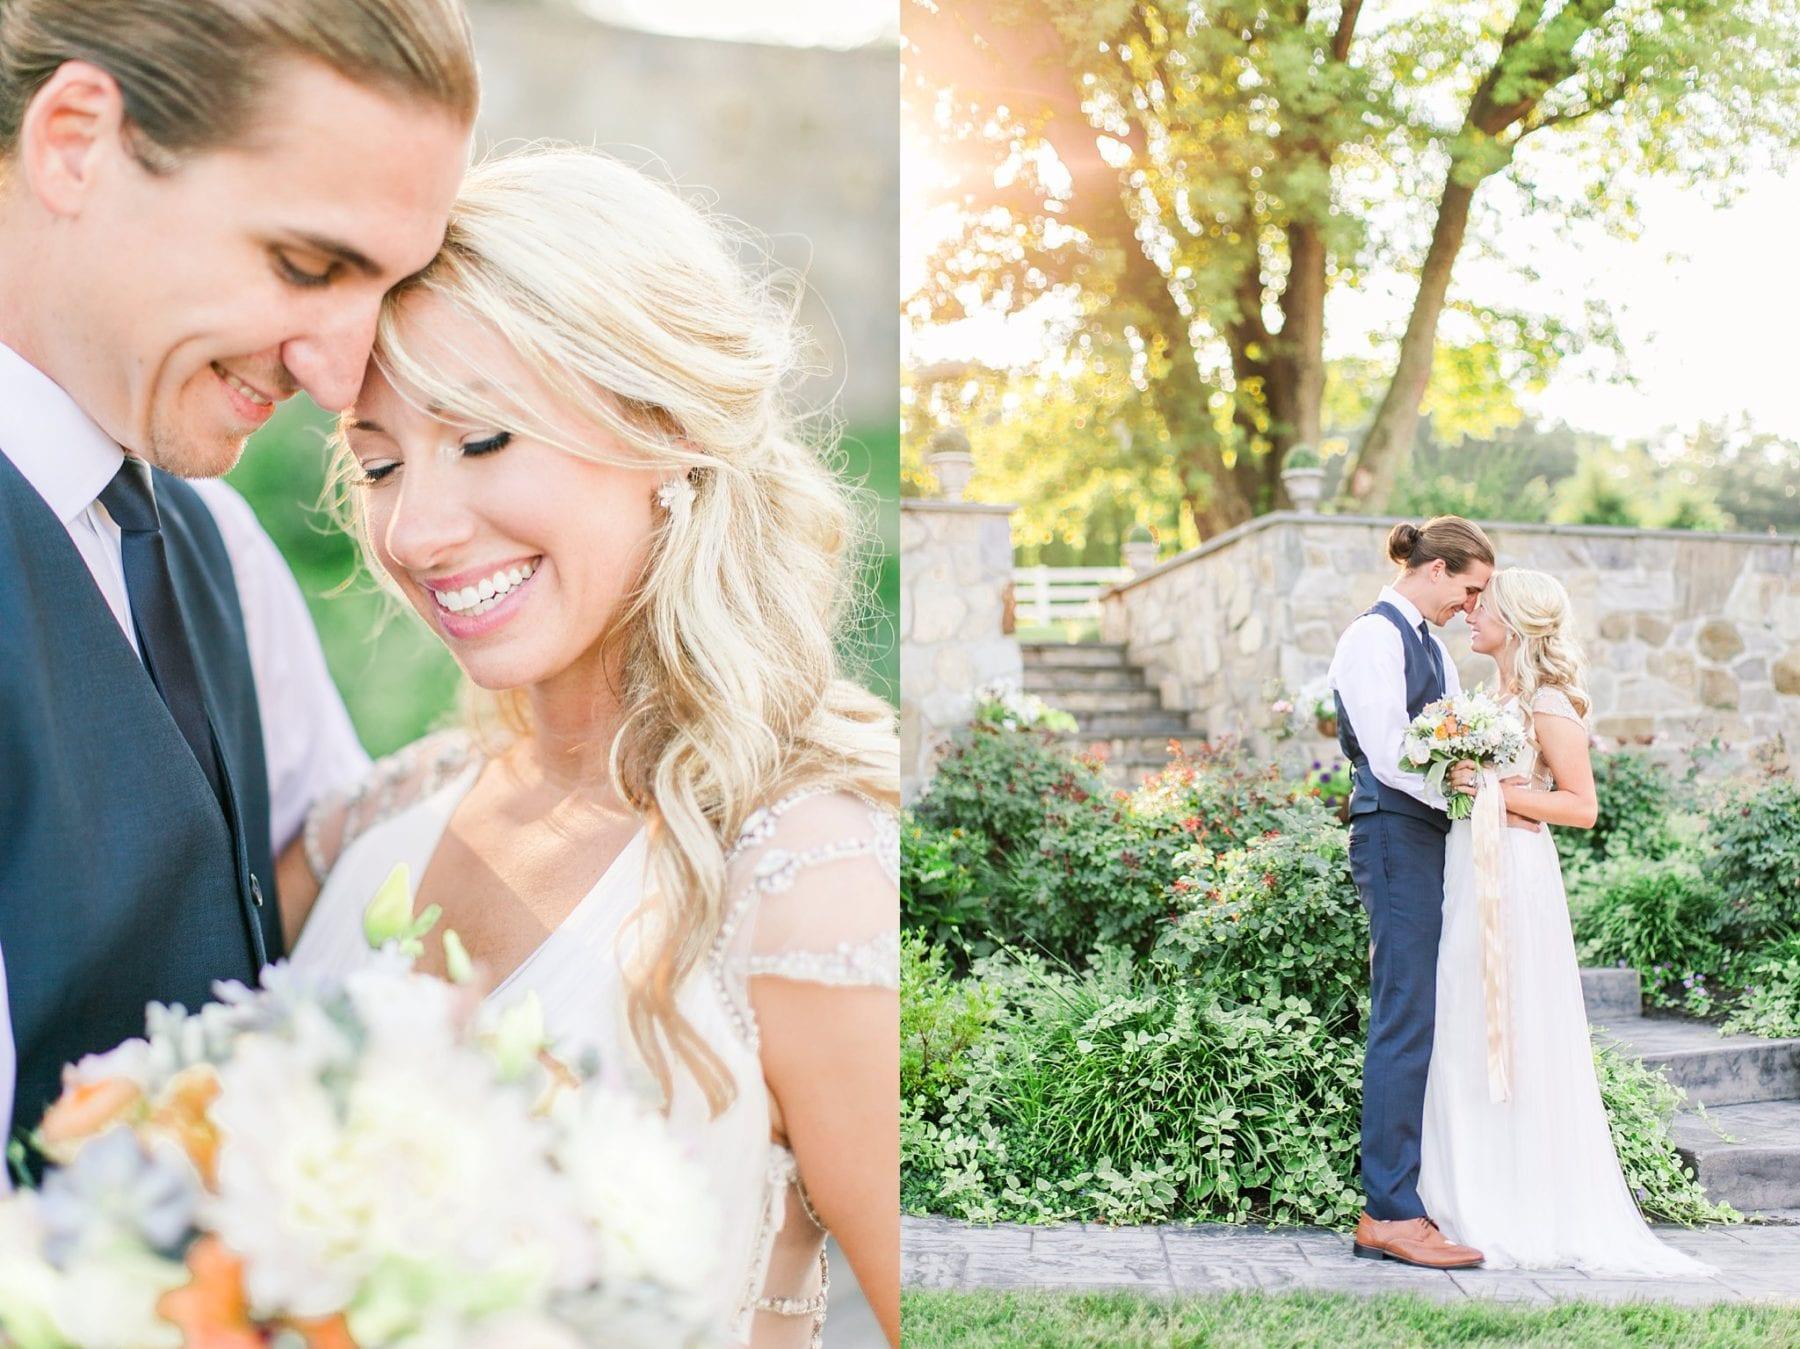 Pond View Farm Wedding Photos Maryland Wedding Photographer Kristen & Ryan Megan Kelsey Photography Blog-235.jpg